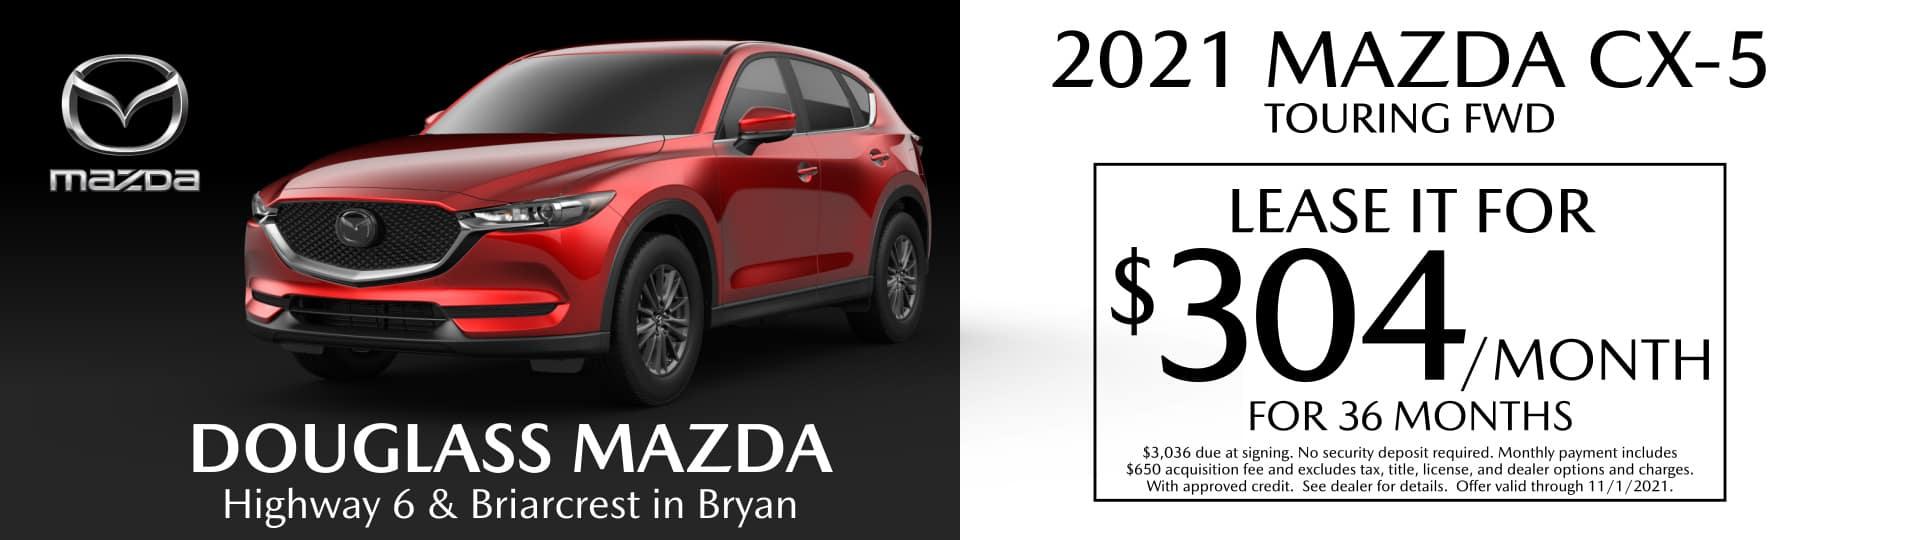 CX-5 Mazda Lease Special